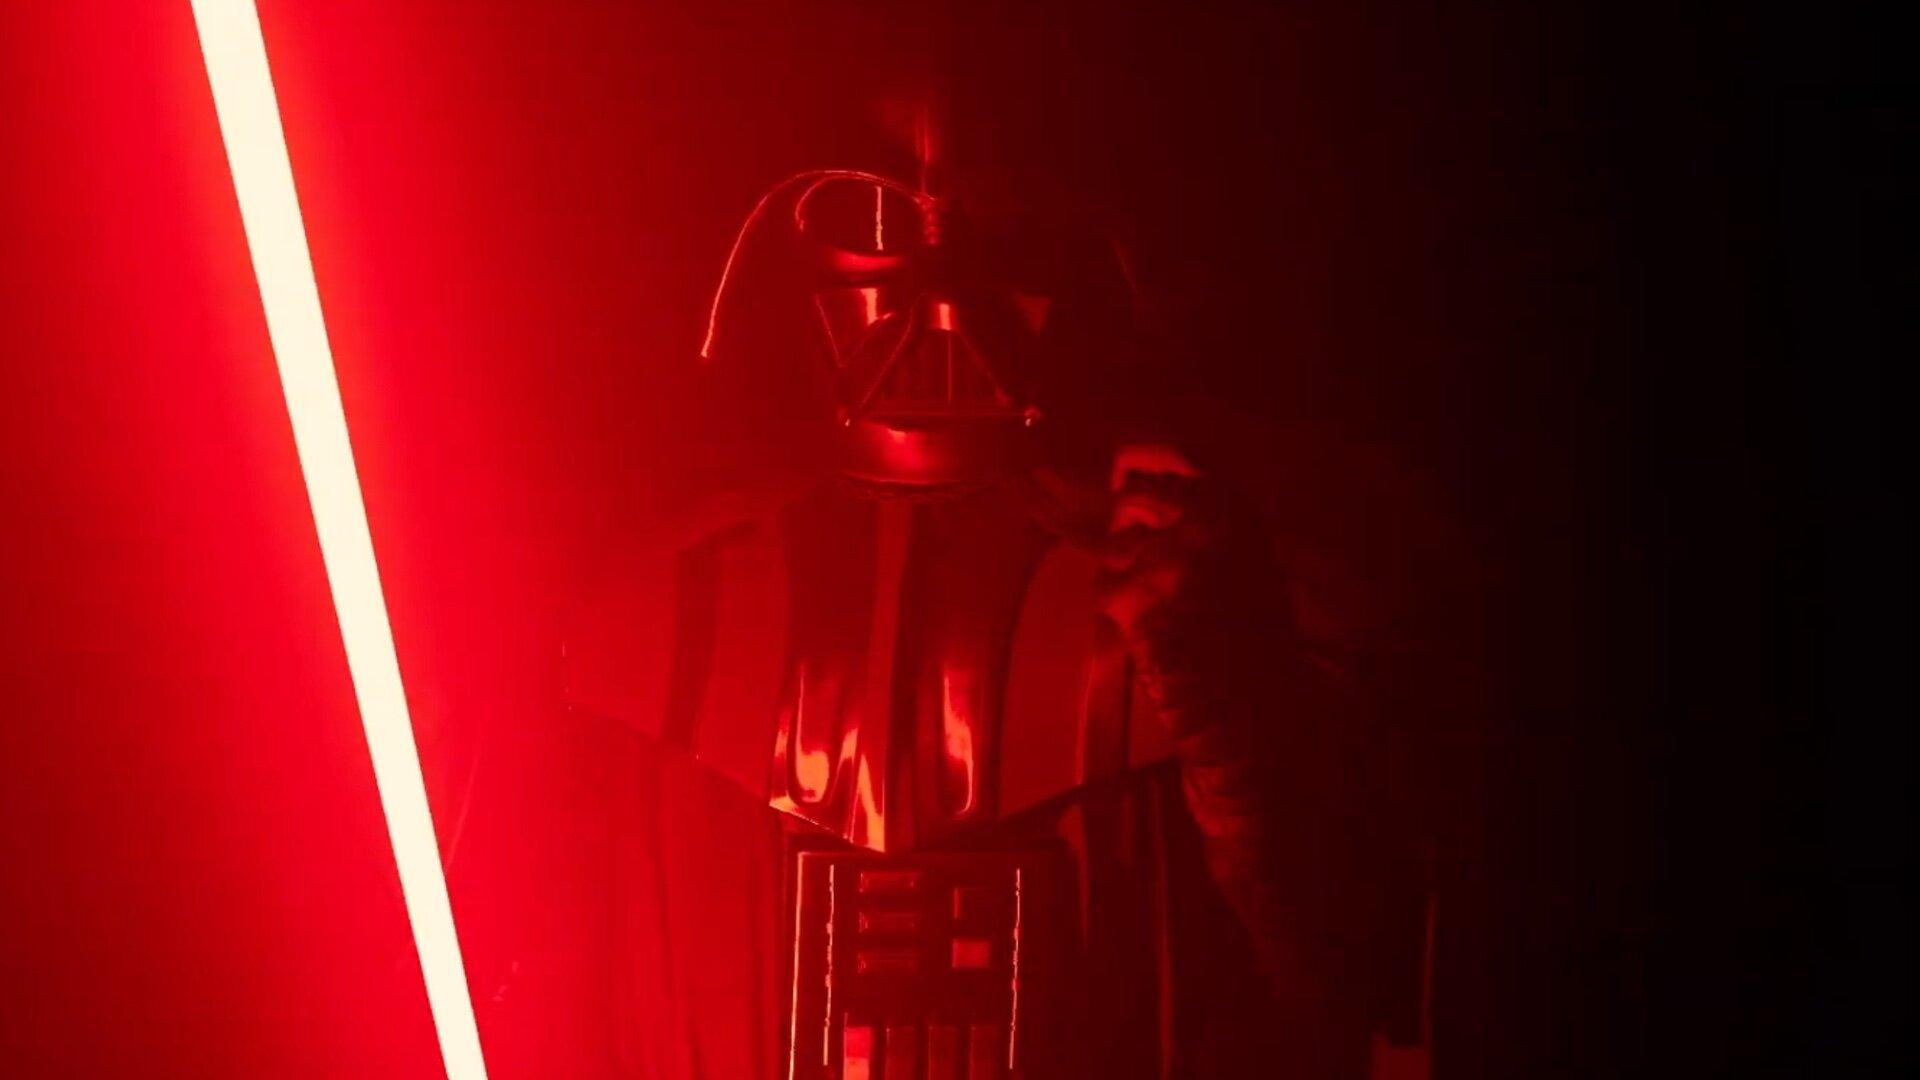 Grab Darth Vaderu0027s lightsaber for just $13 and show Luke